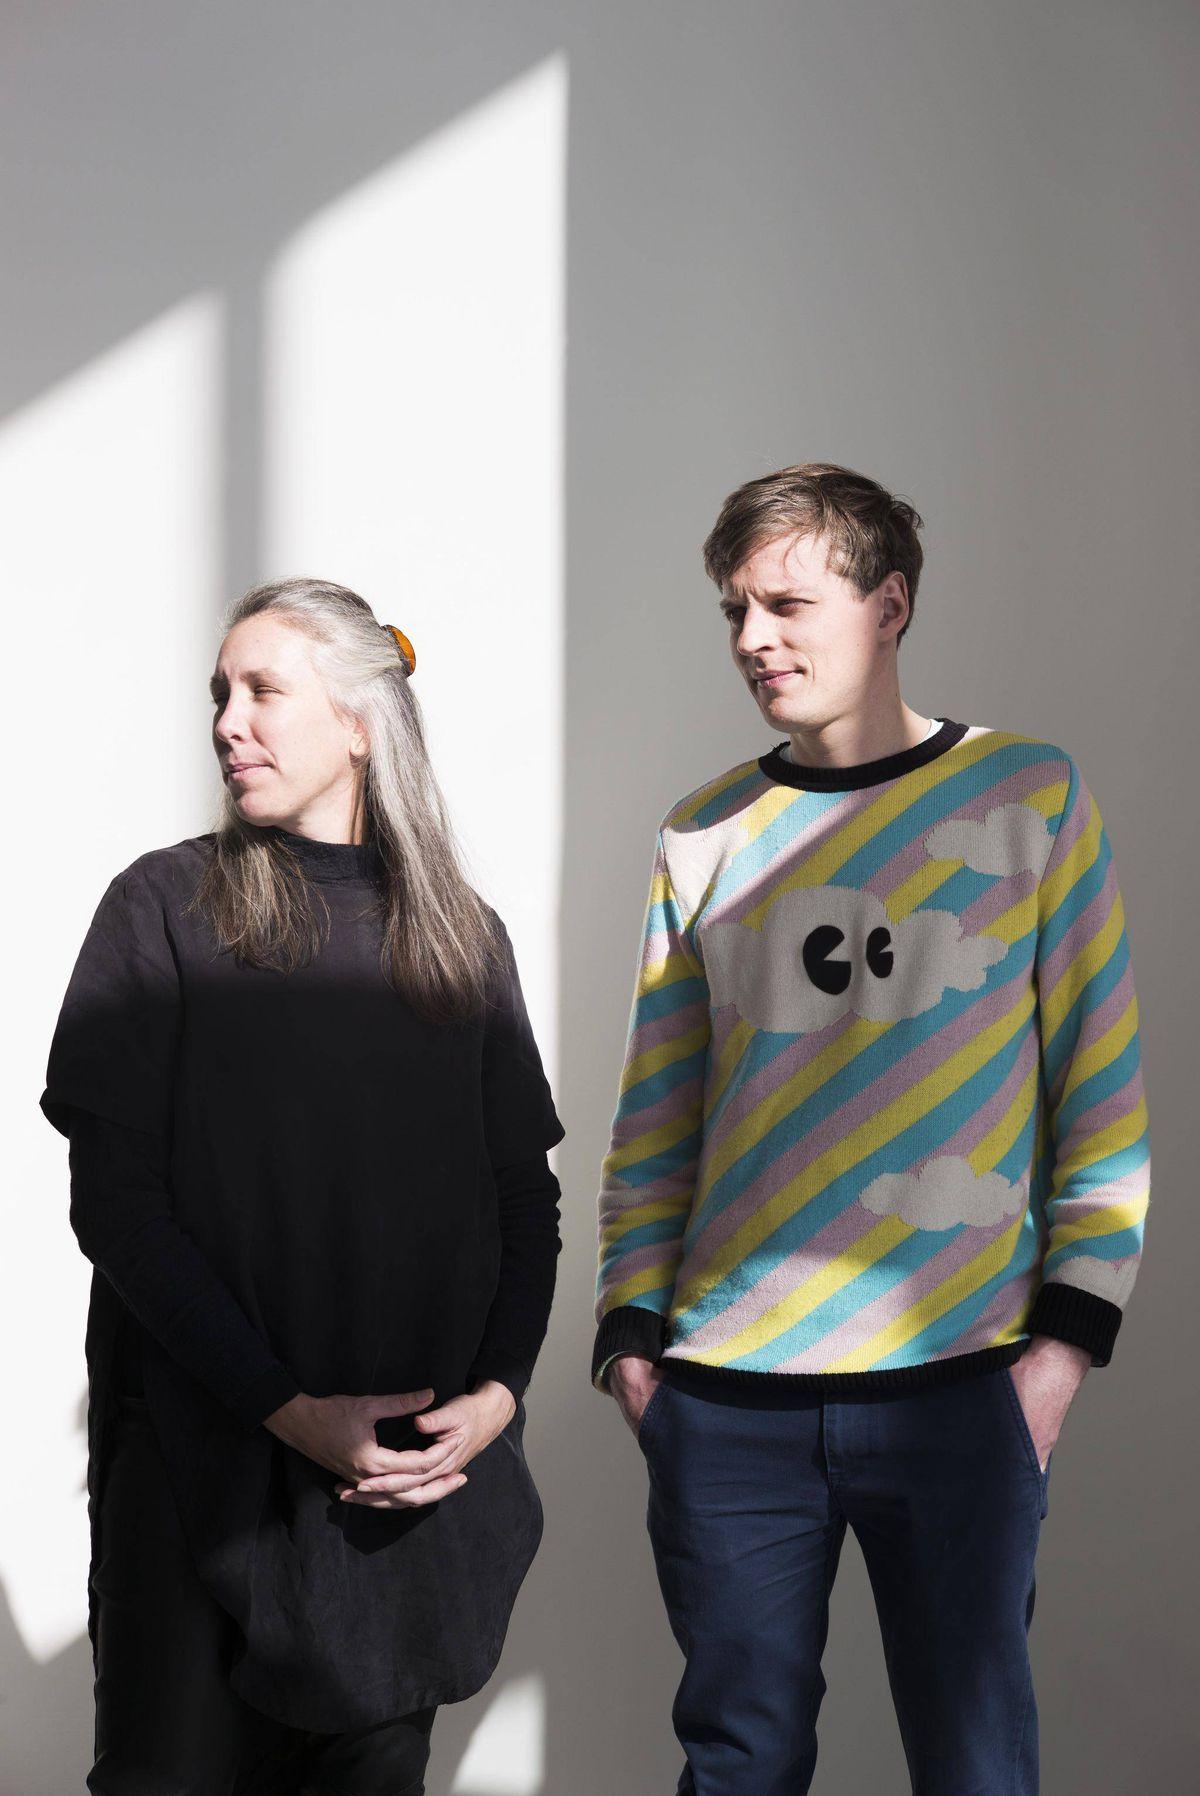 Ian Willms / Boreal Collective